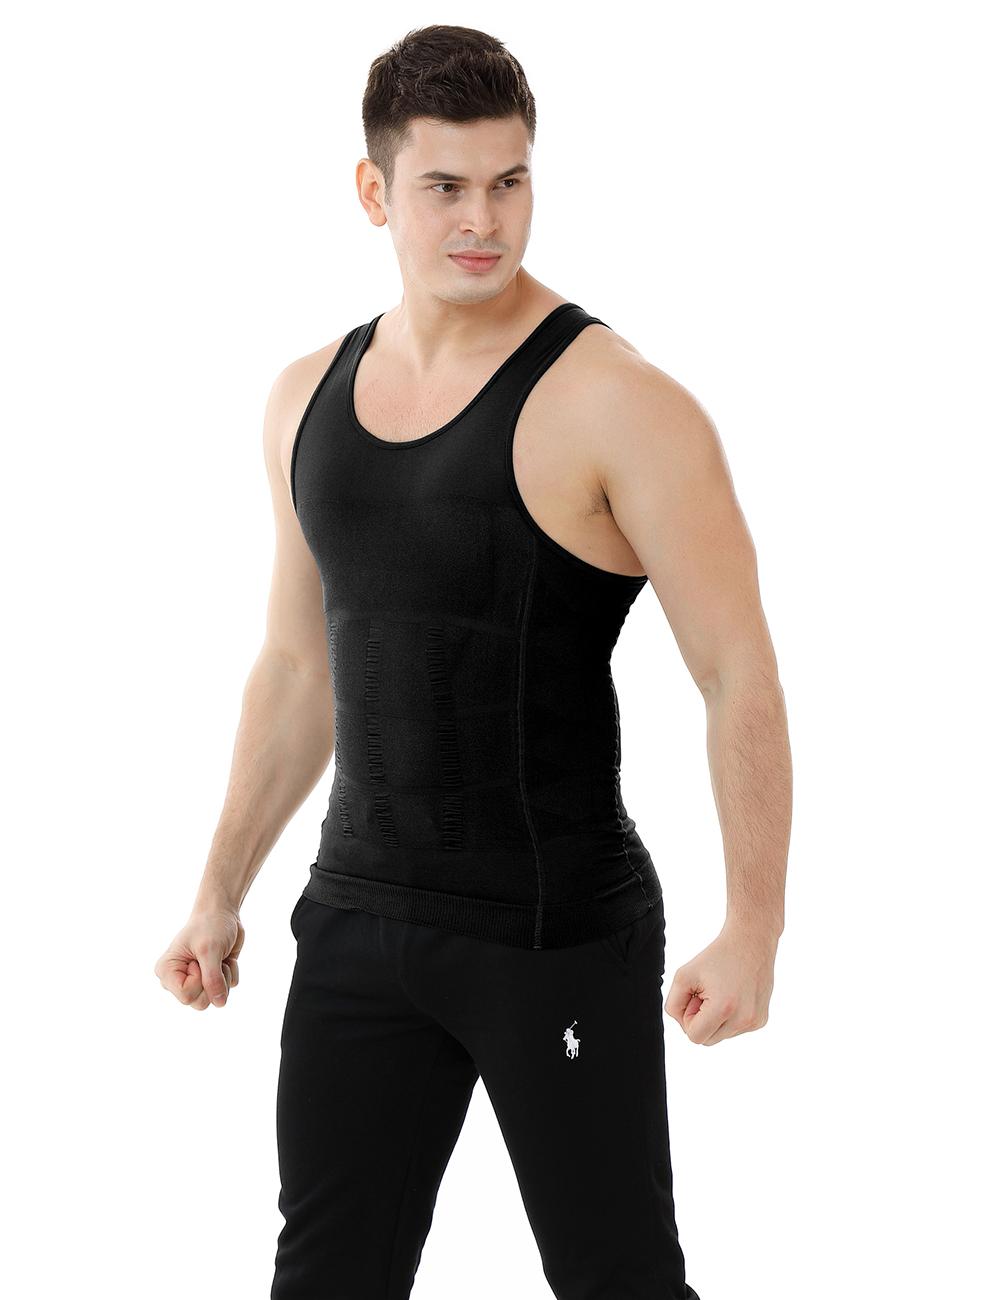 4a084037a72e5 Opentip.com  Men Slimming Body Shaper Compression Shirt Slim Fit Shapewear  Mens Shirts Undershirts Bulk Sale